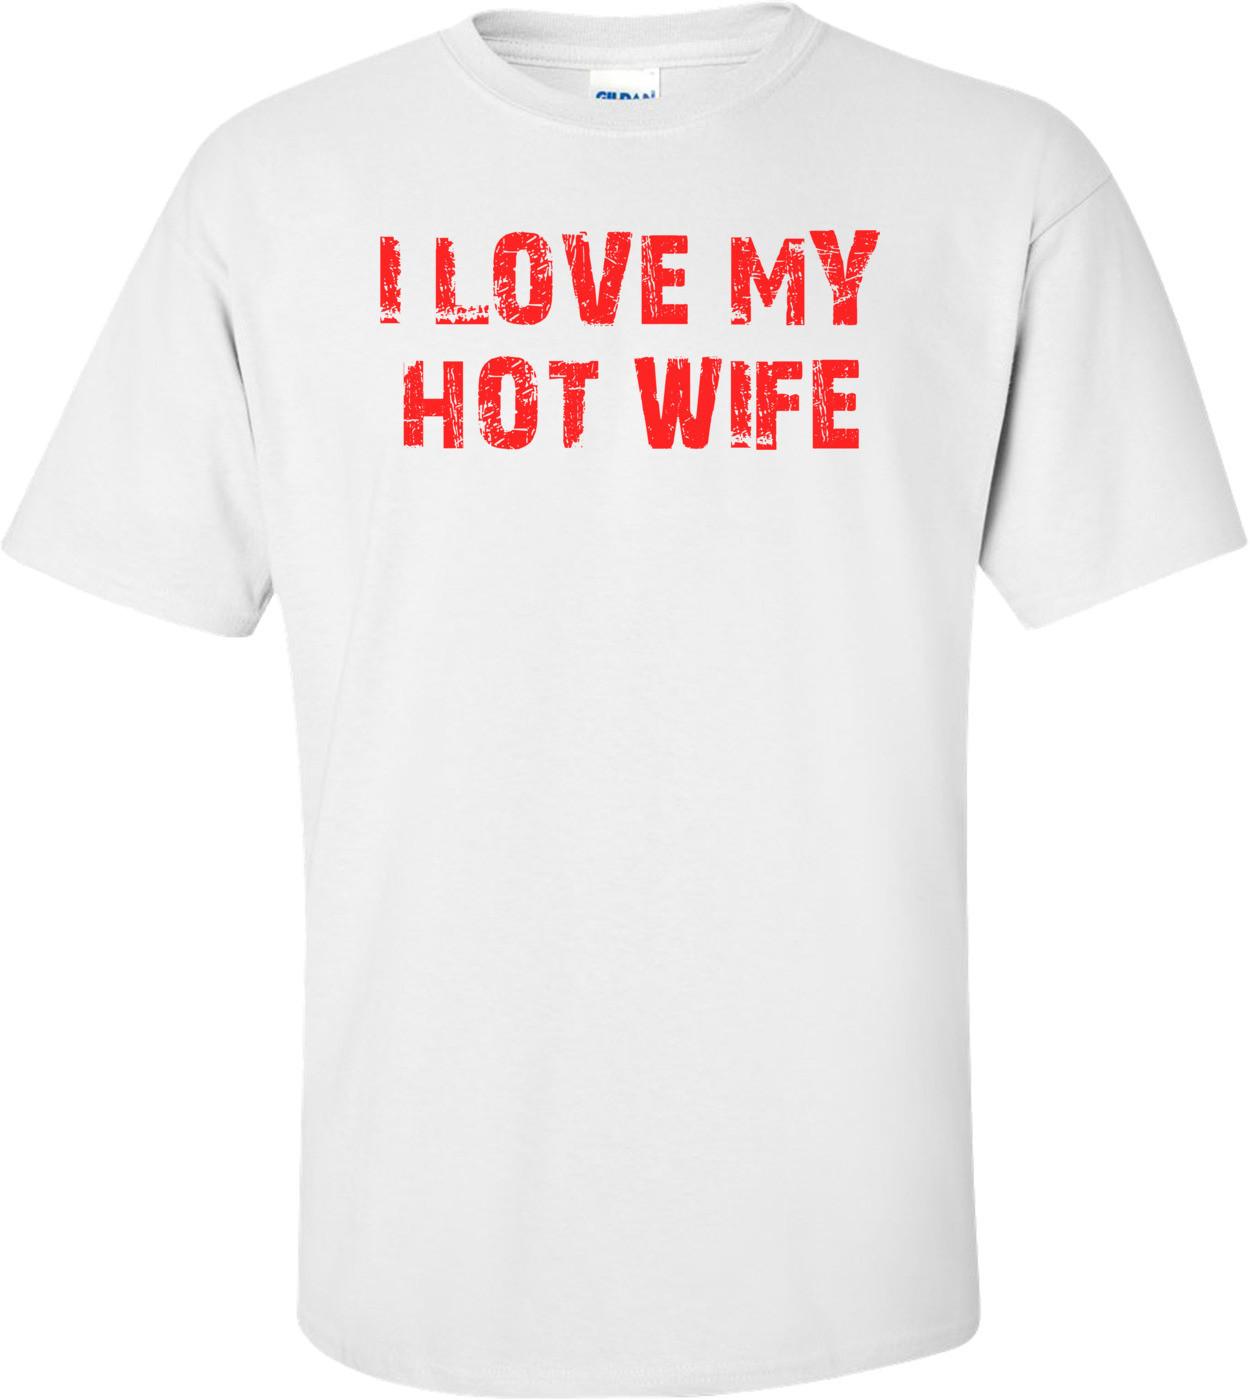 I LOVE MY HOT WIFE Shirt